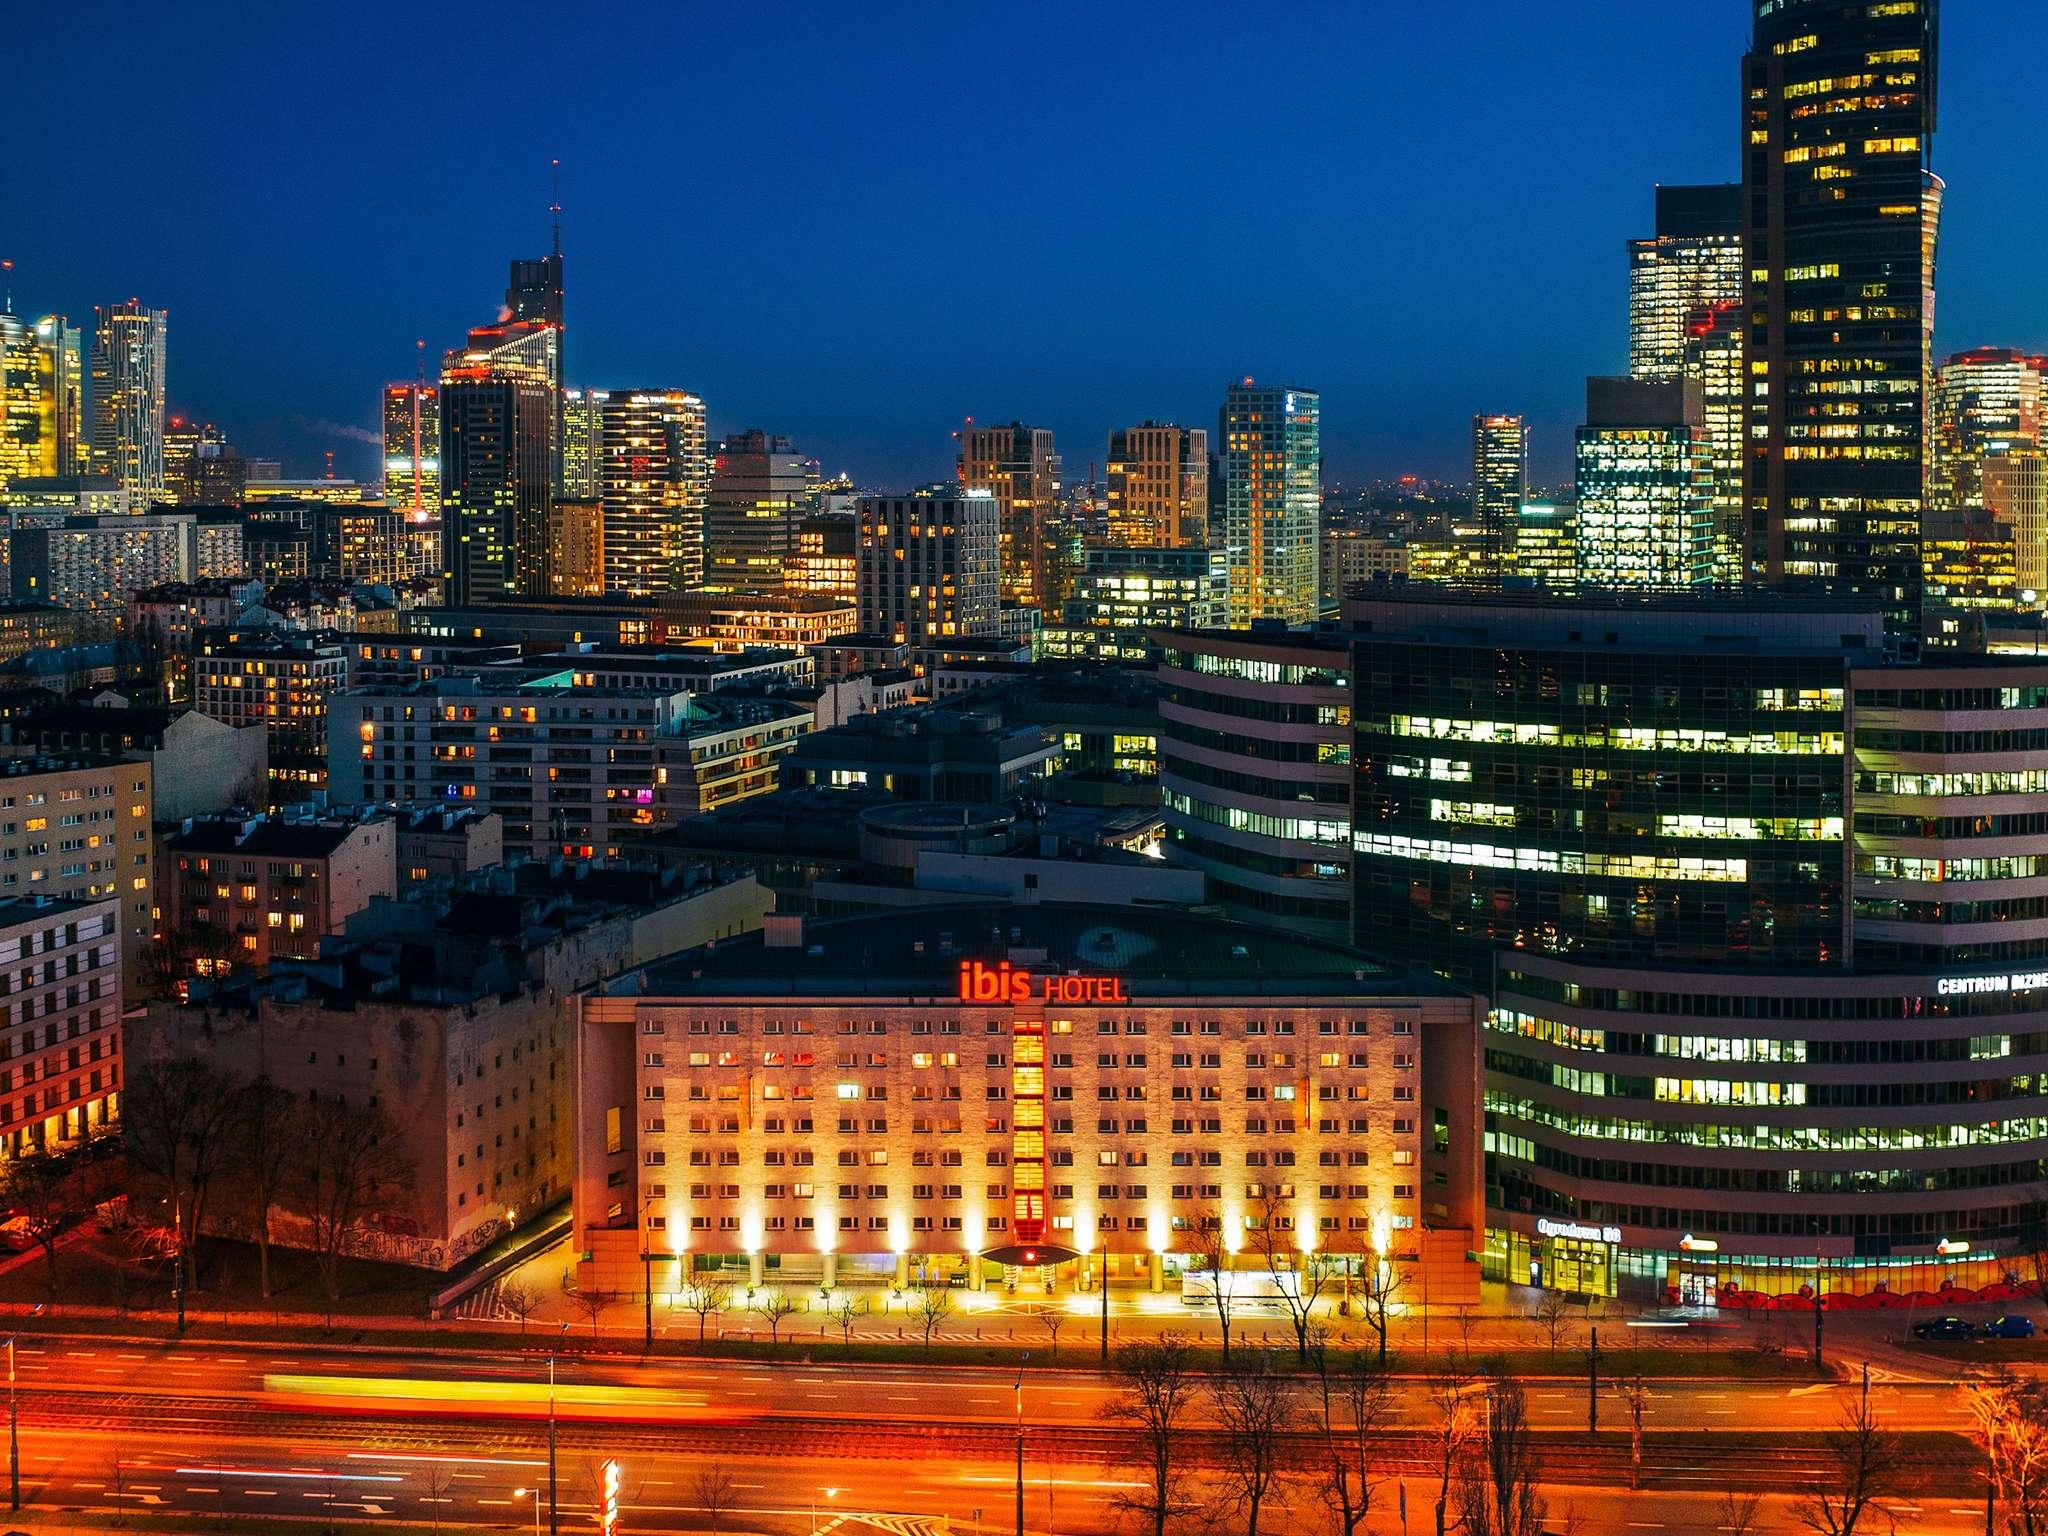 فندق - ibis Warszawa Centrum - Hostel Warszawa Centrum